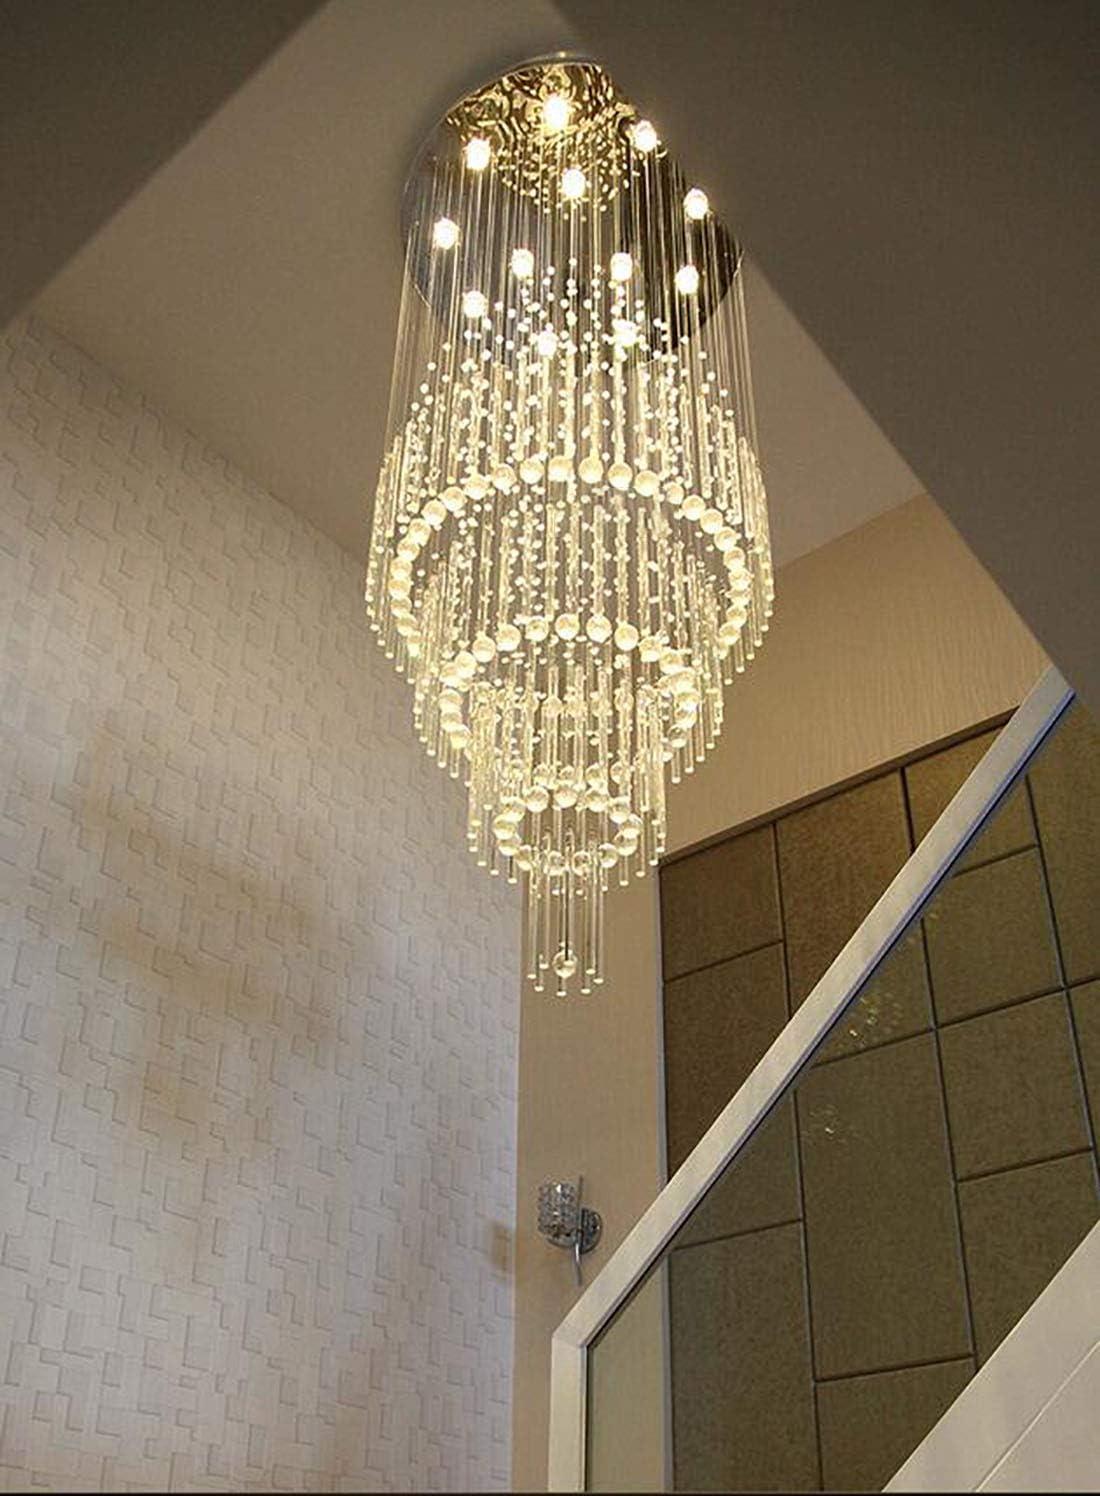 D31.4″H102″ Modern Large Crystal Chandelier Villa Spiral Entrance Lighting Grand Foyer Raindrop Chandelier Hallway Ceiling Light Fixture